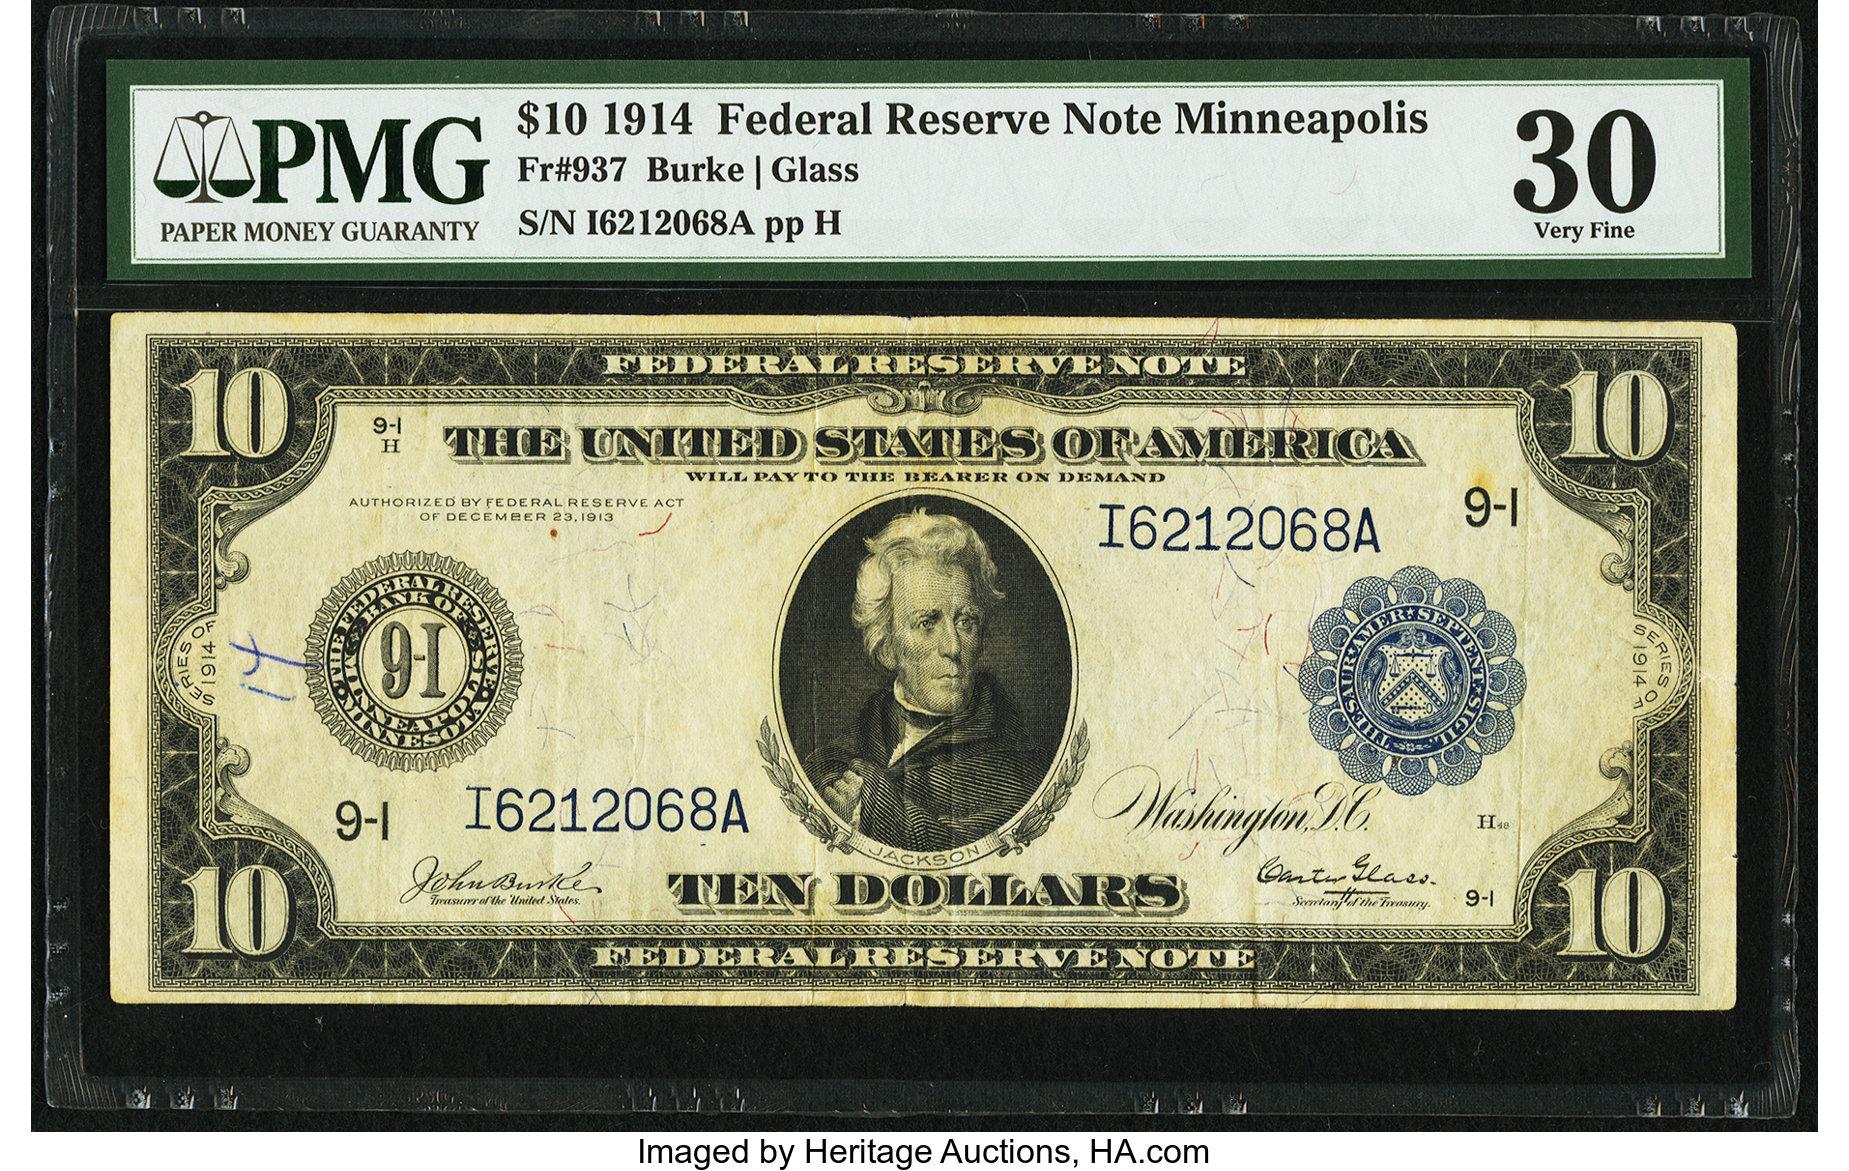 sample image for Fr.937 $10 Minneapolis